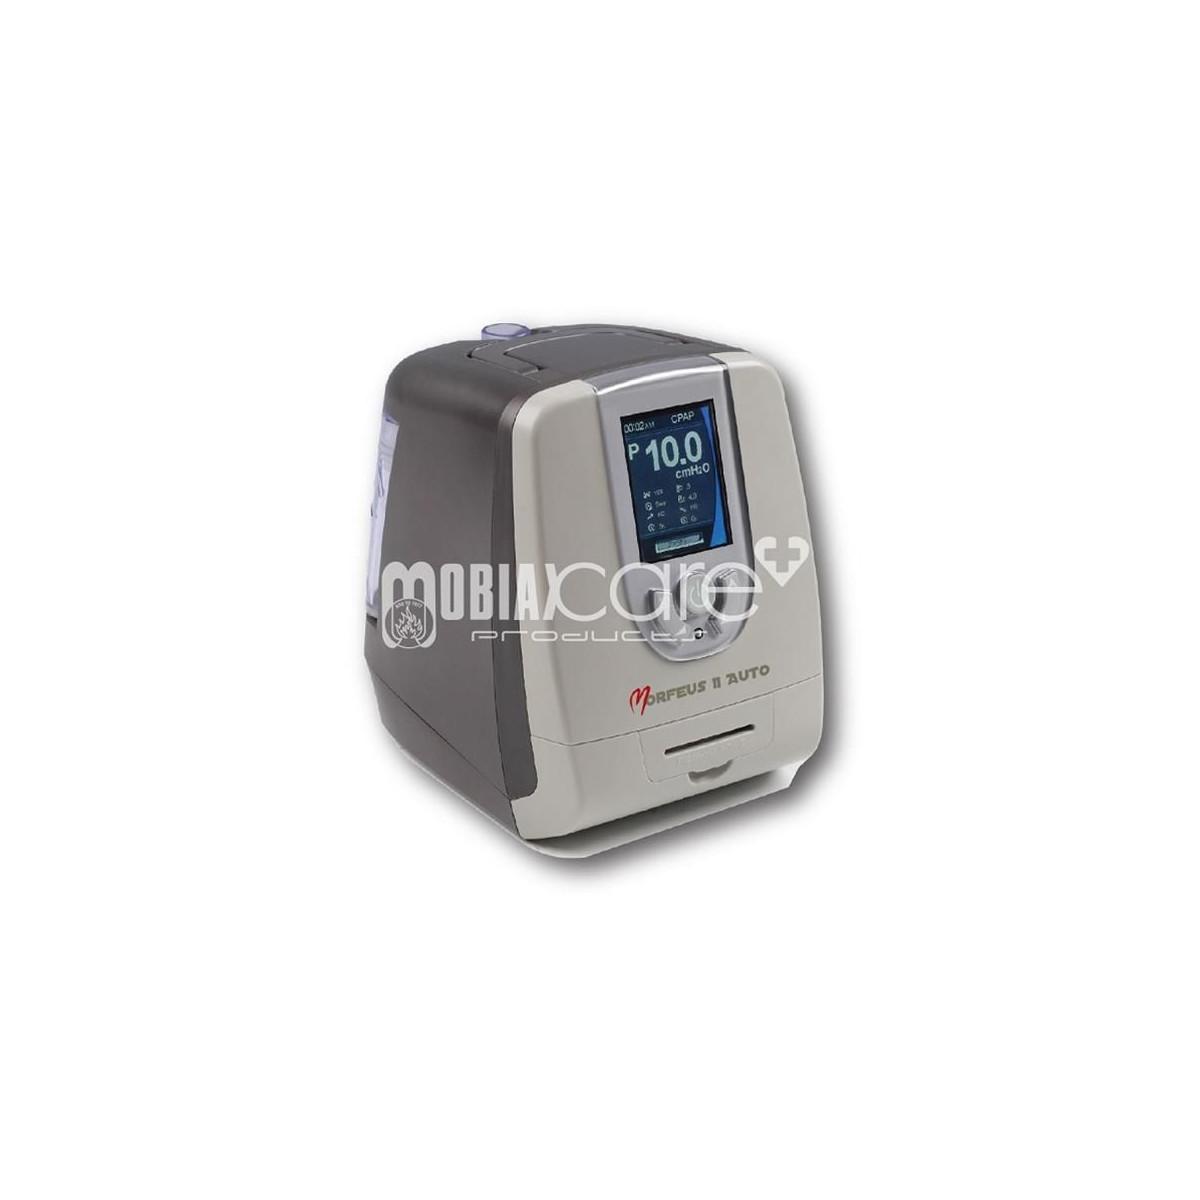 CPAP Morfeus II Auto